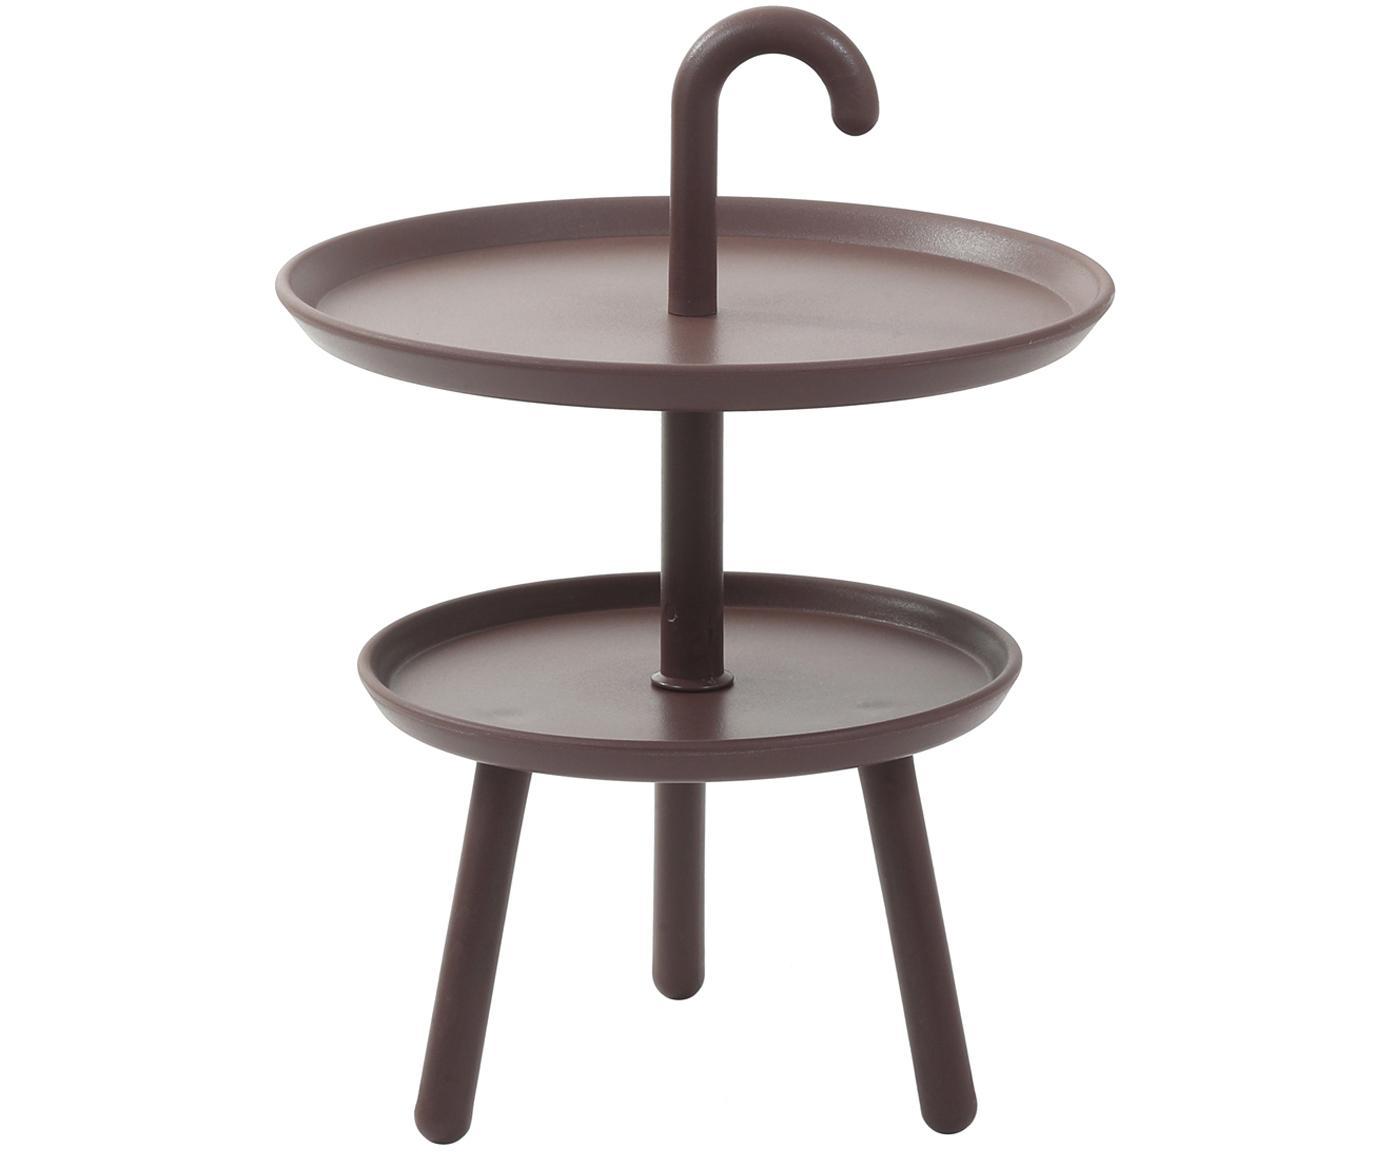 Tavolino rotondo in plastica Rodi, Polipropilene, Marrone, Ø 42 x Alt. 56 cm